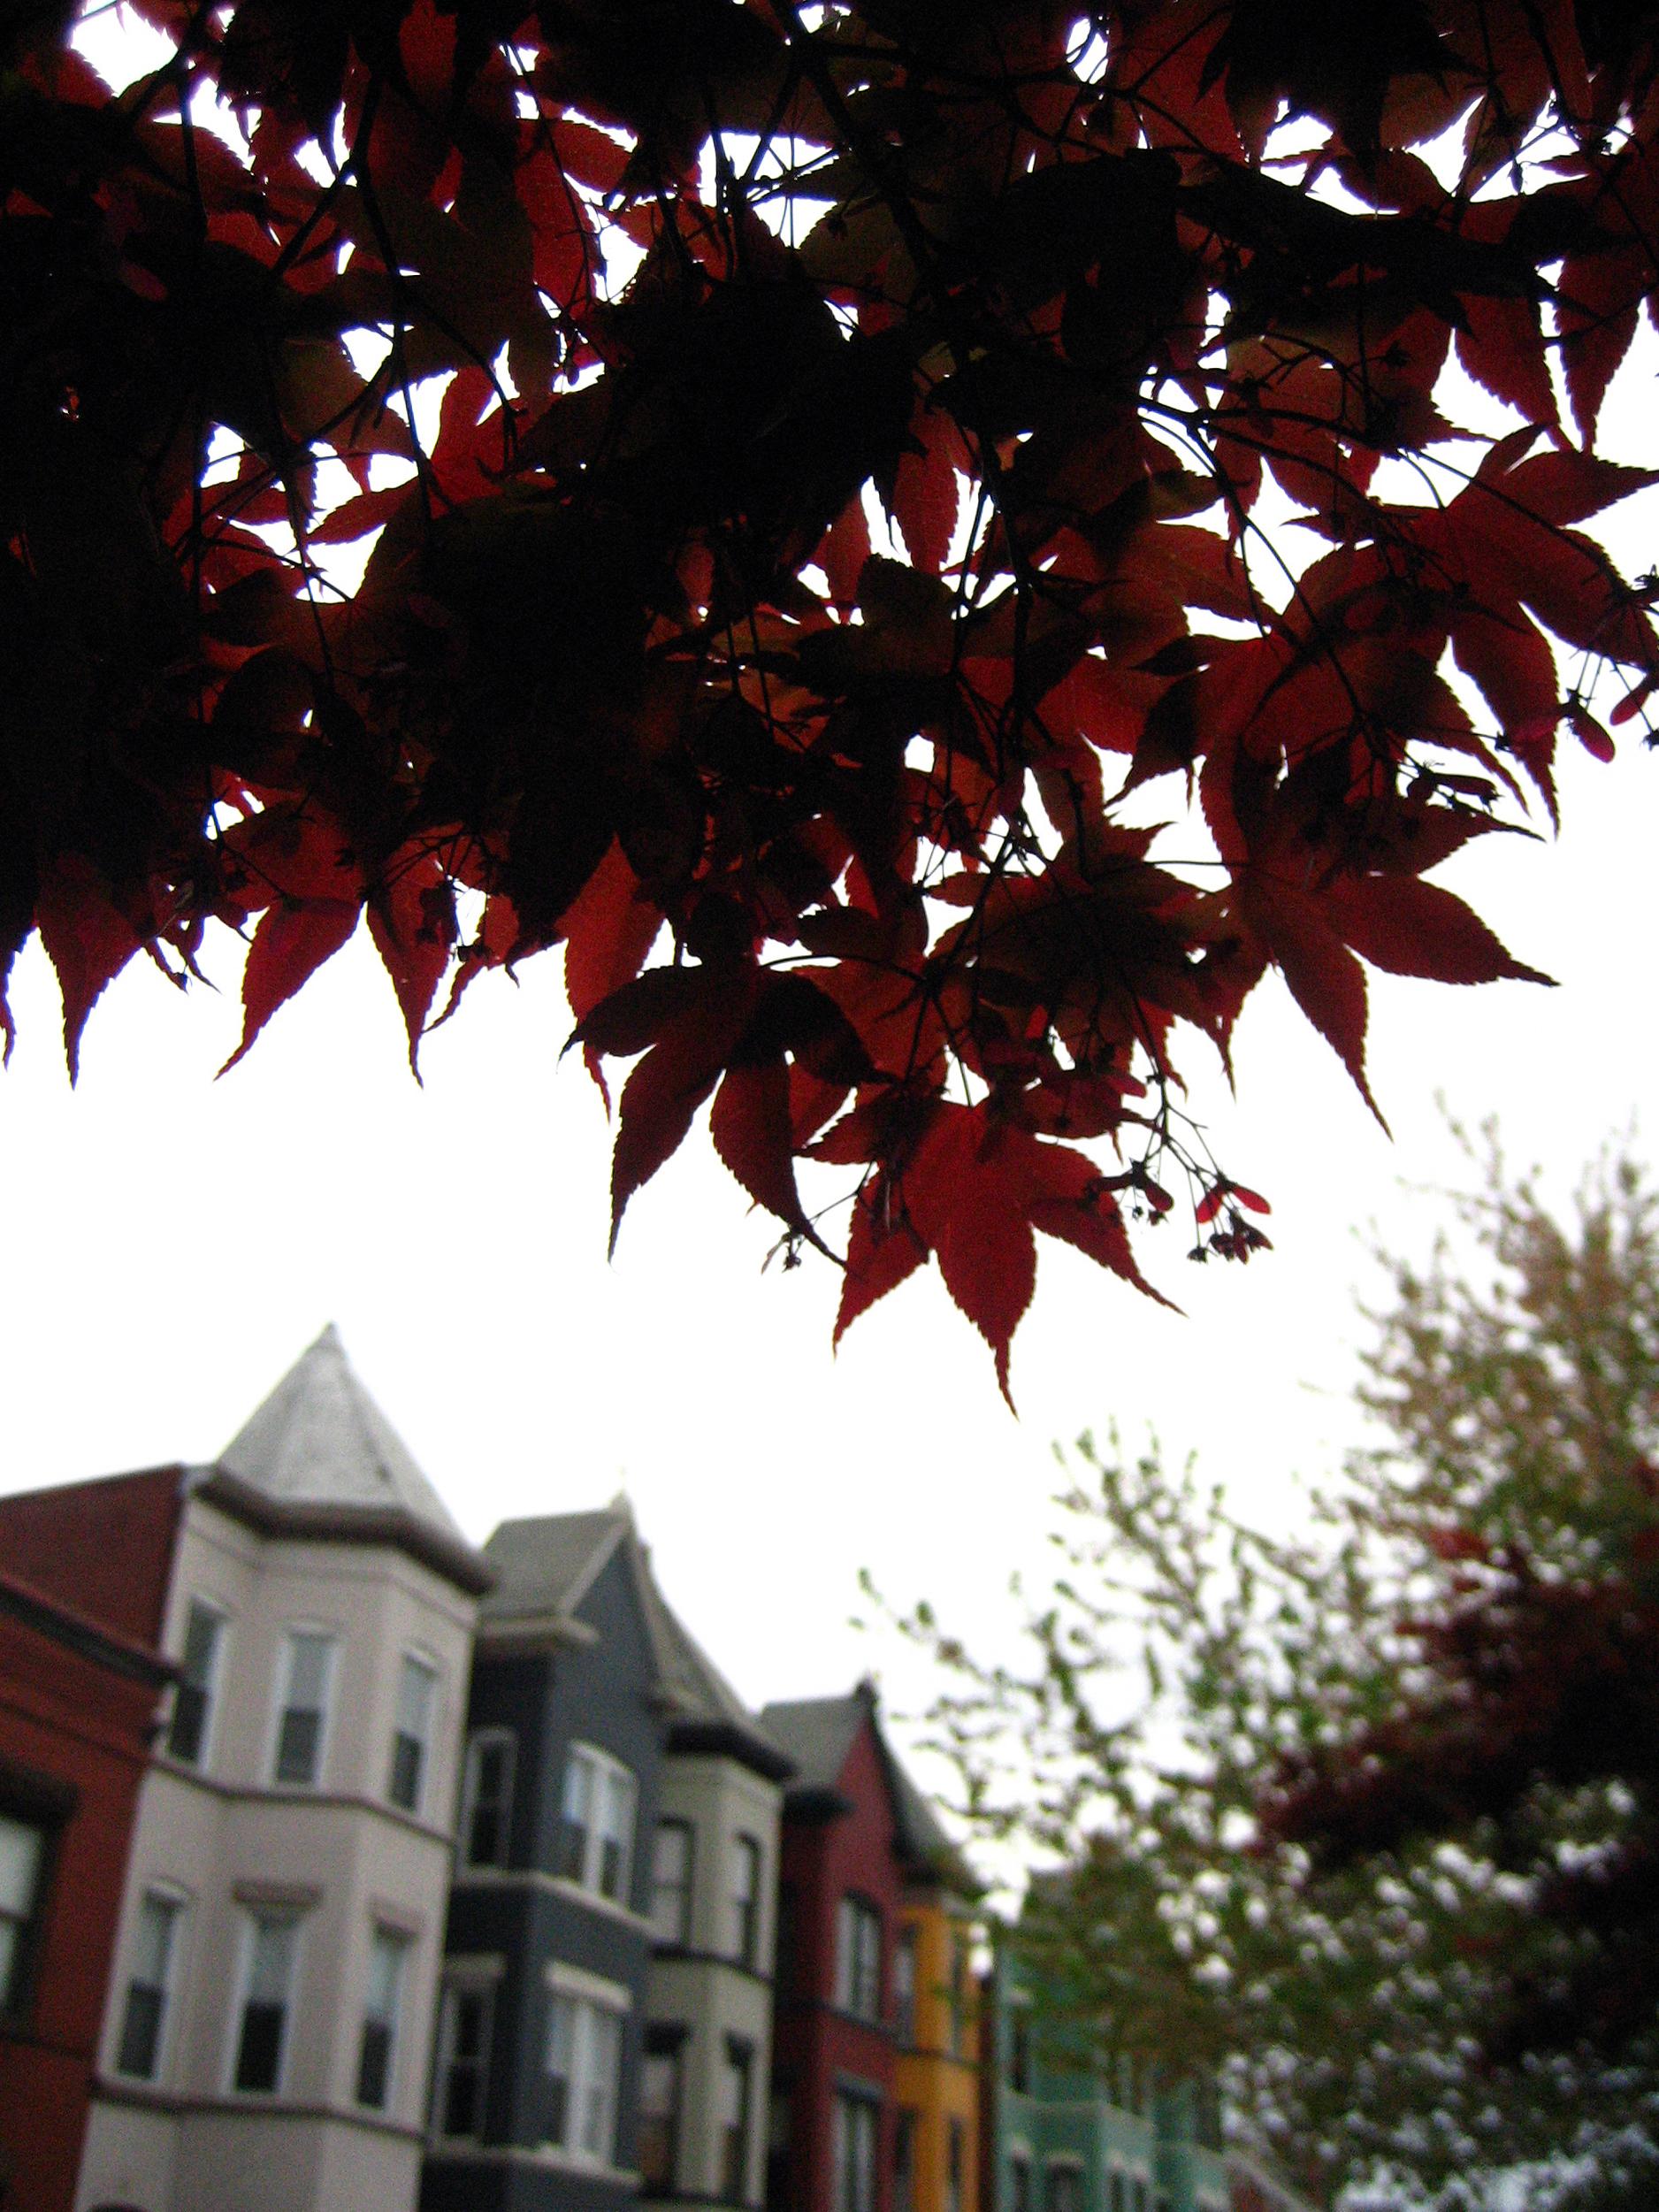 Bloomingdale Neighborhood, Washington D.C., April 2006